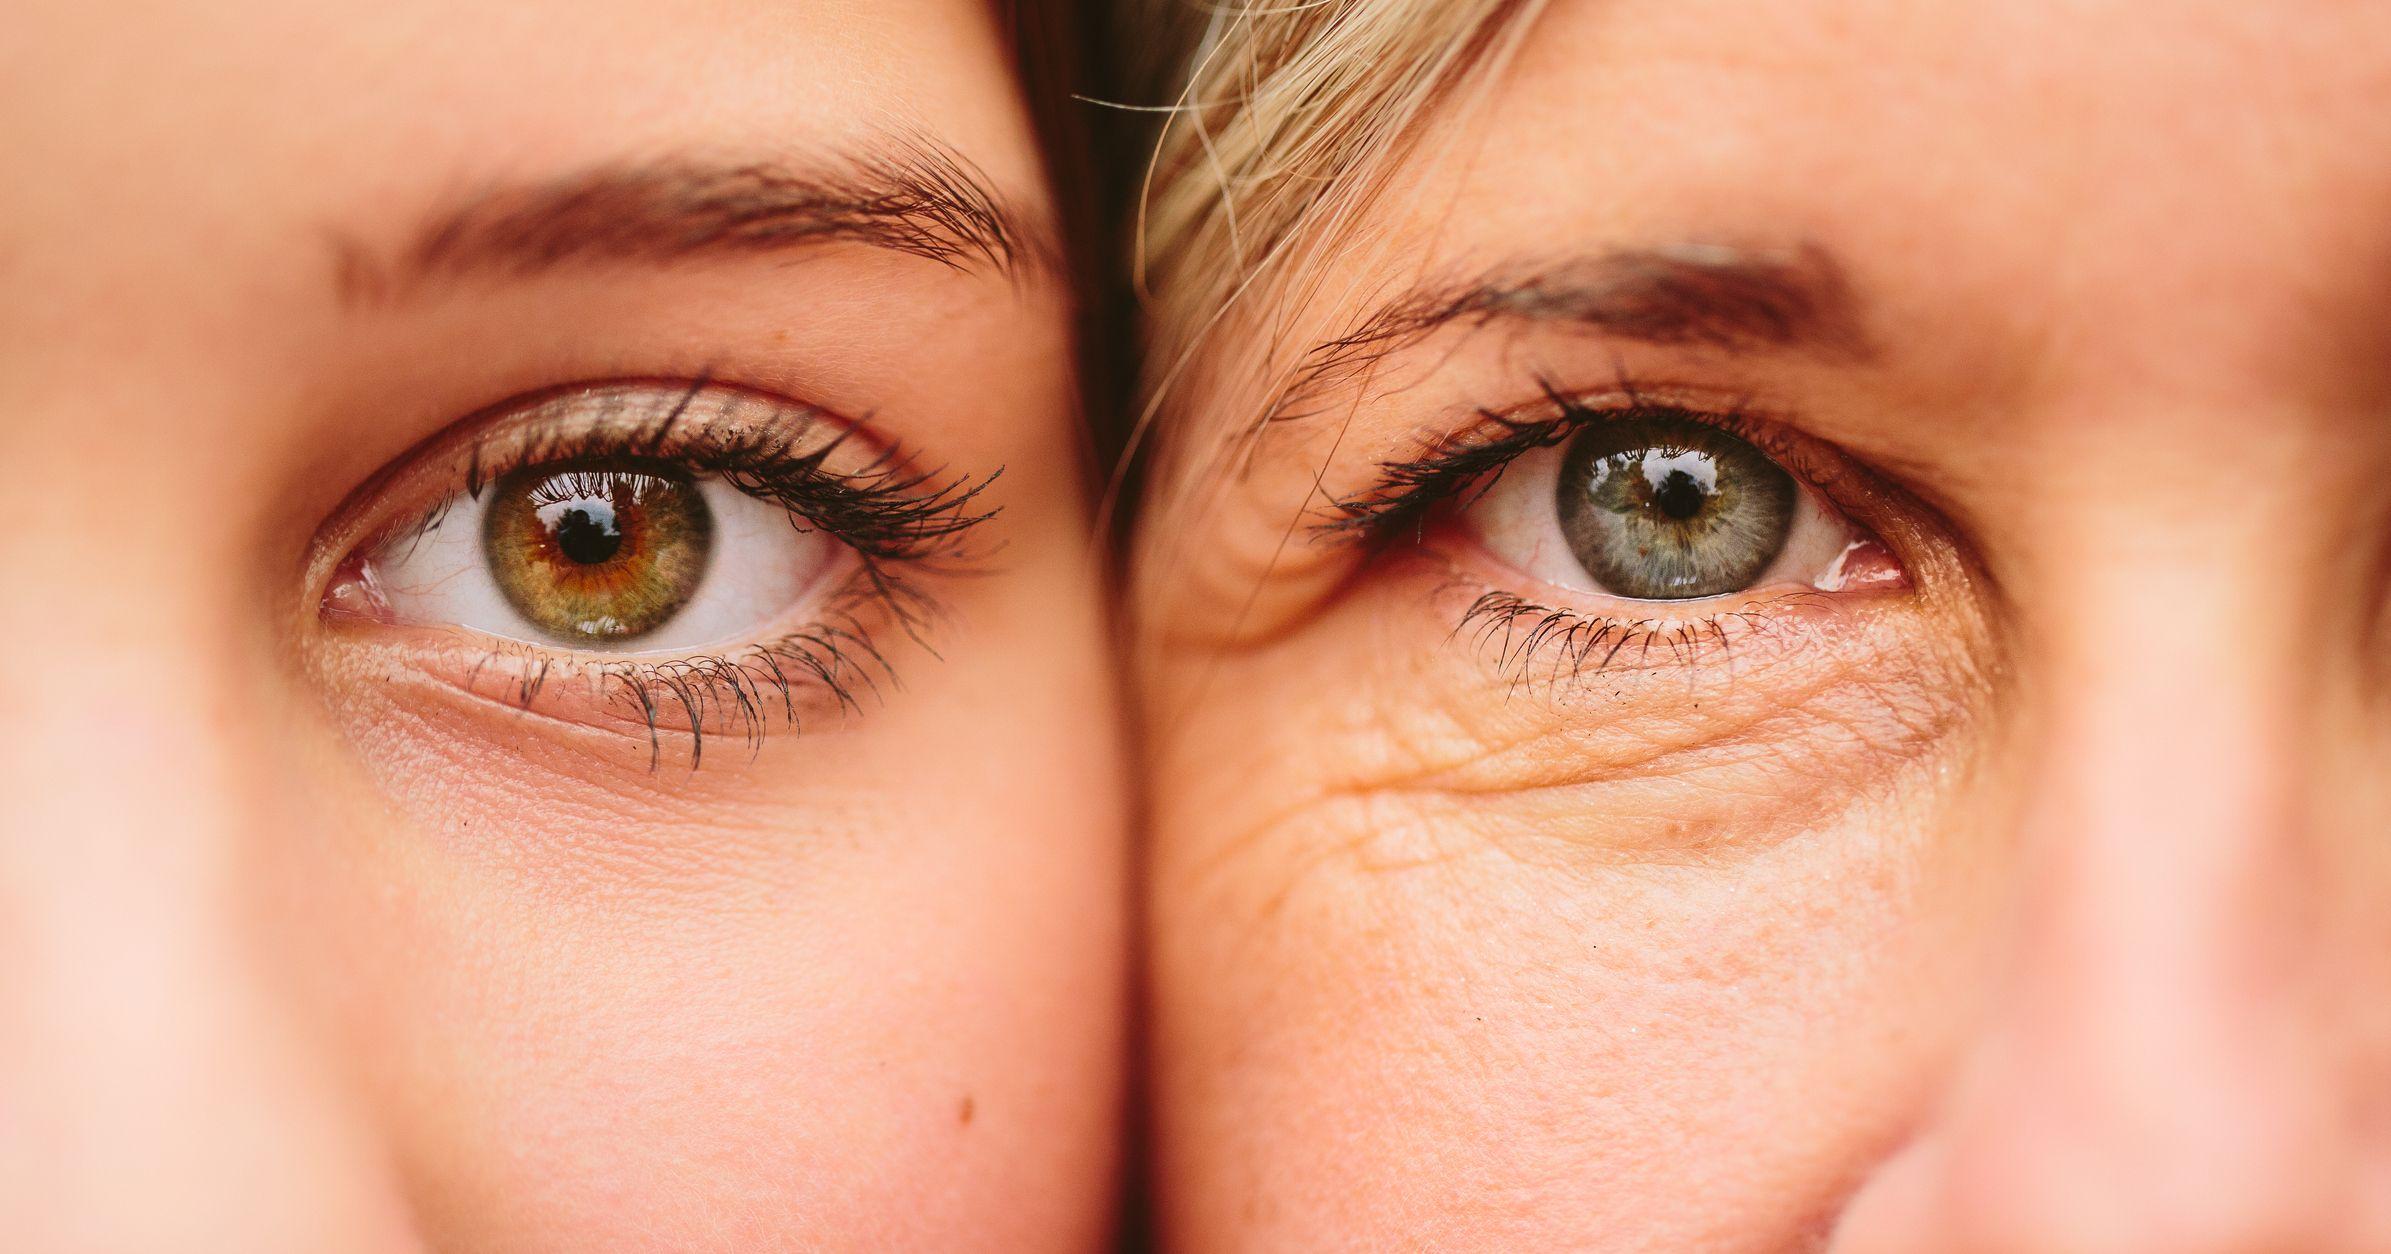 Under eye wrinkle cream